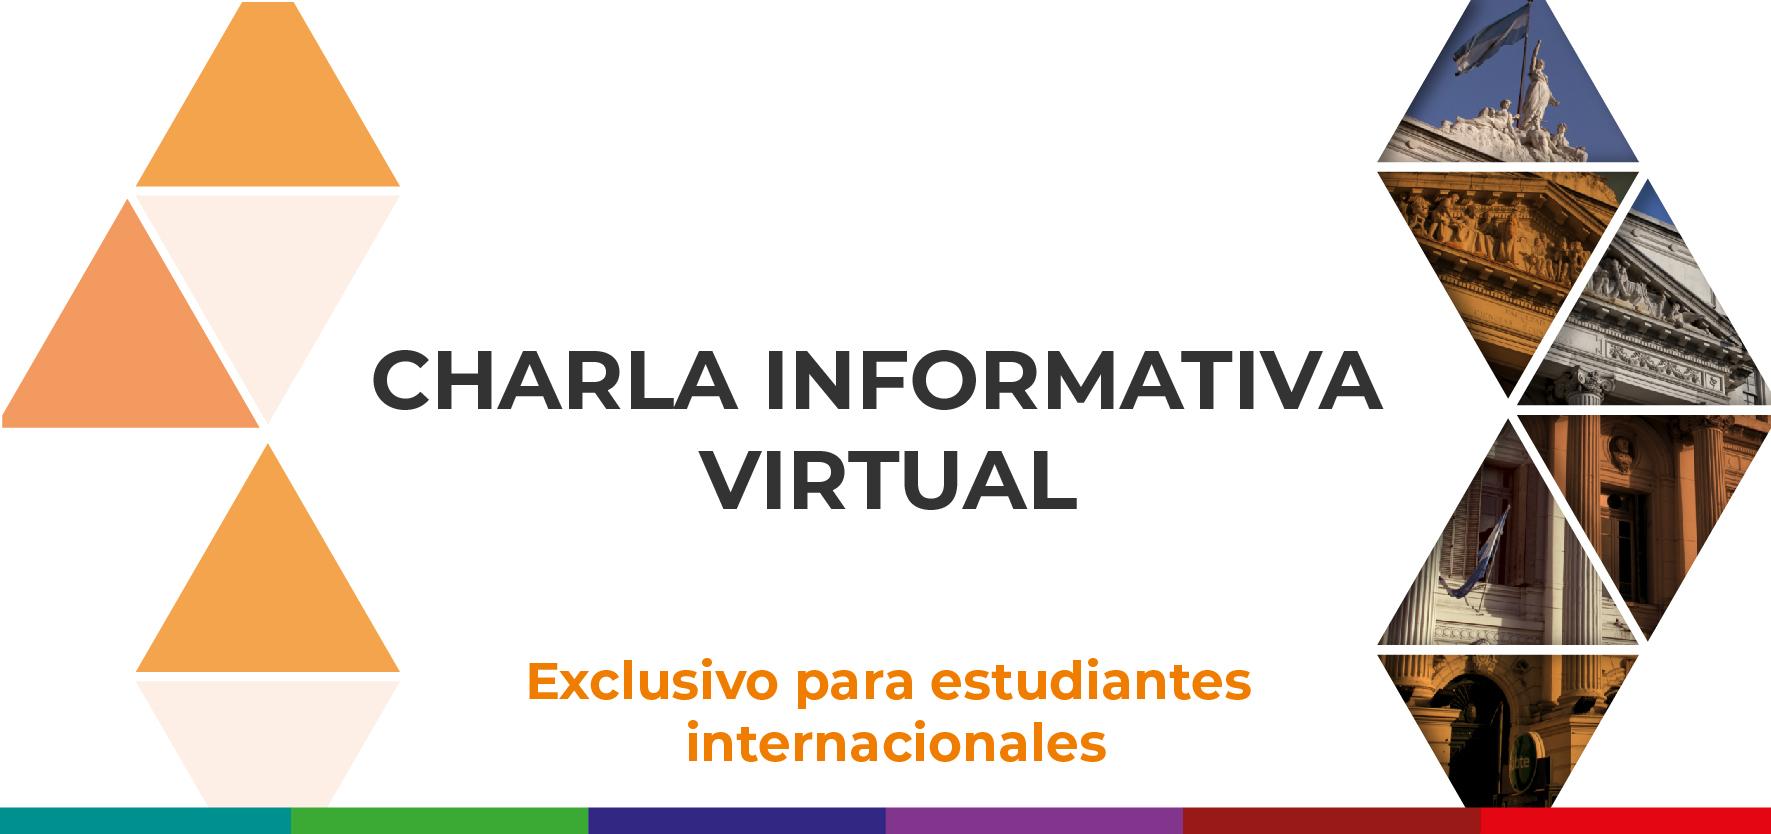 charla-informativa-virtual